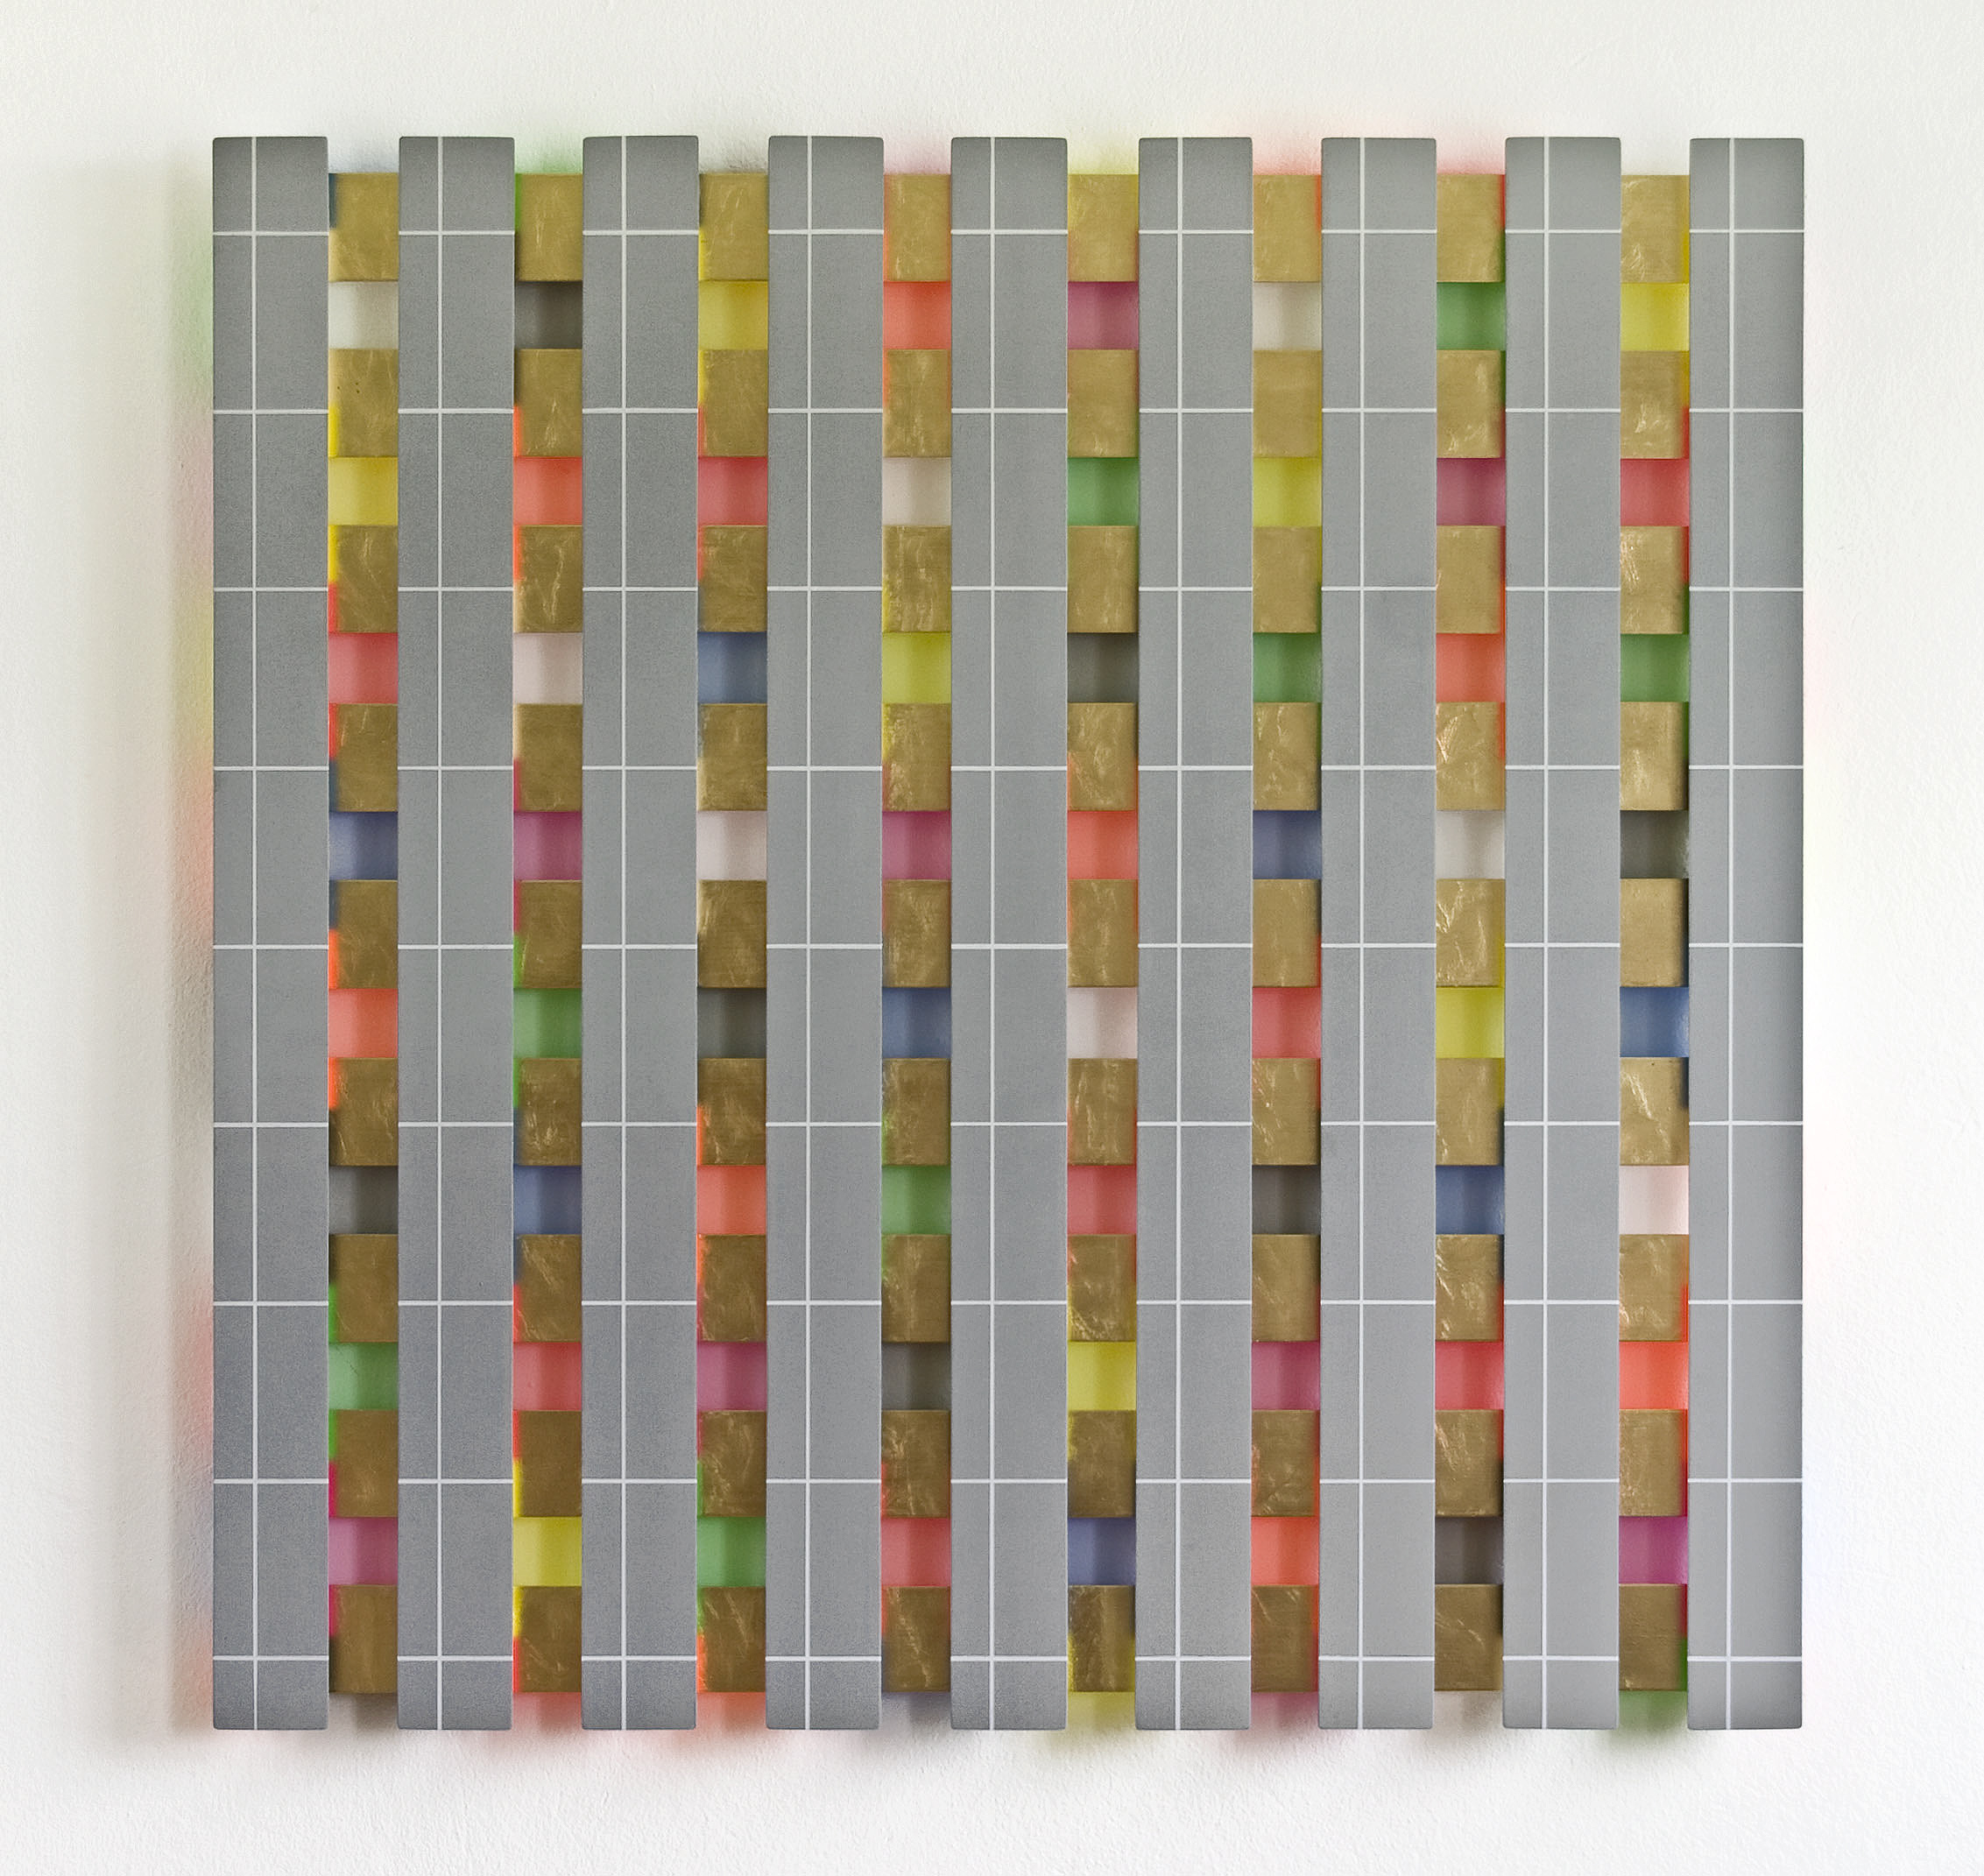 3b akril, les, 121 x 121 cm, 2009.jpg